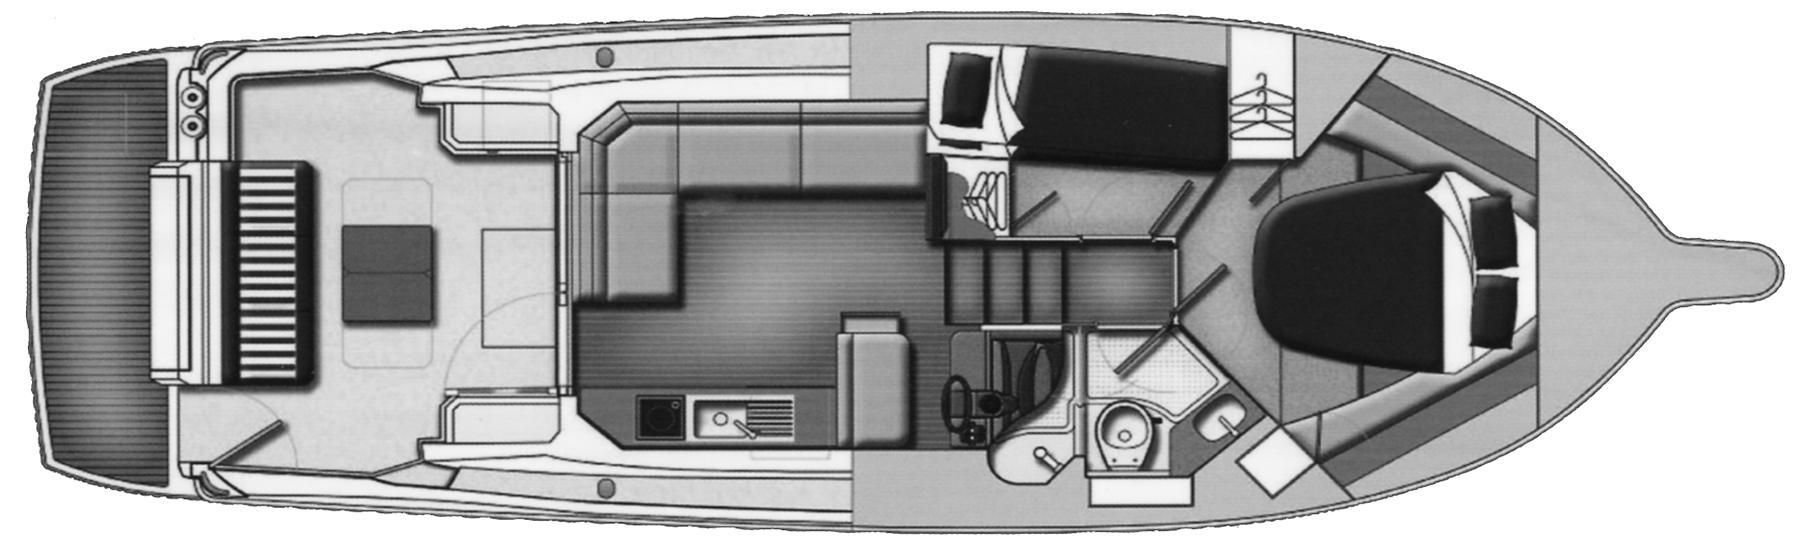 3600 Sport Yacht Floor Plan 1